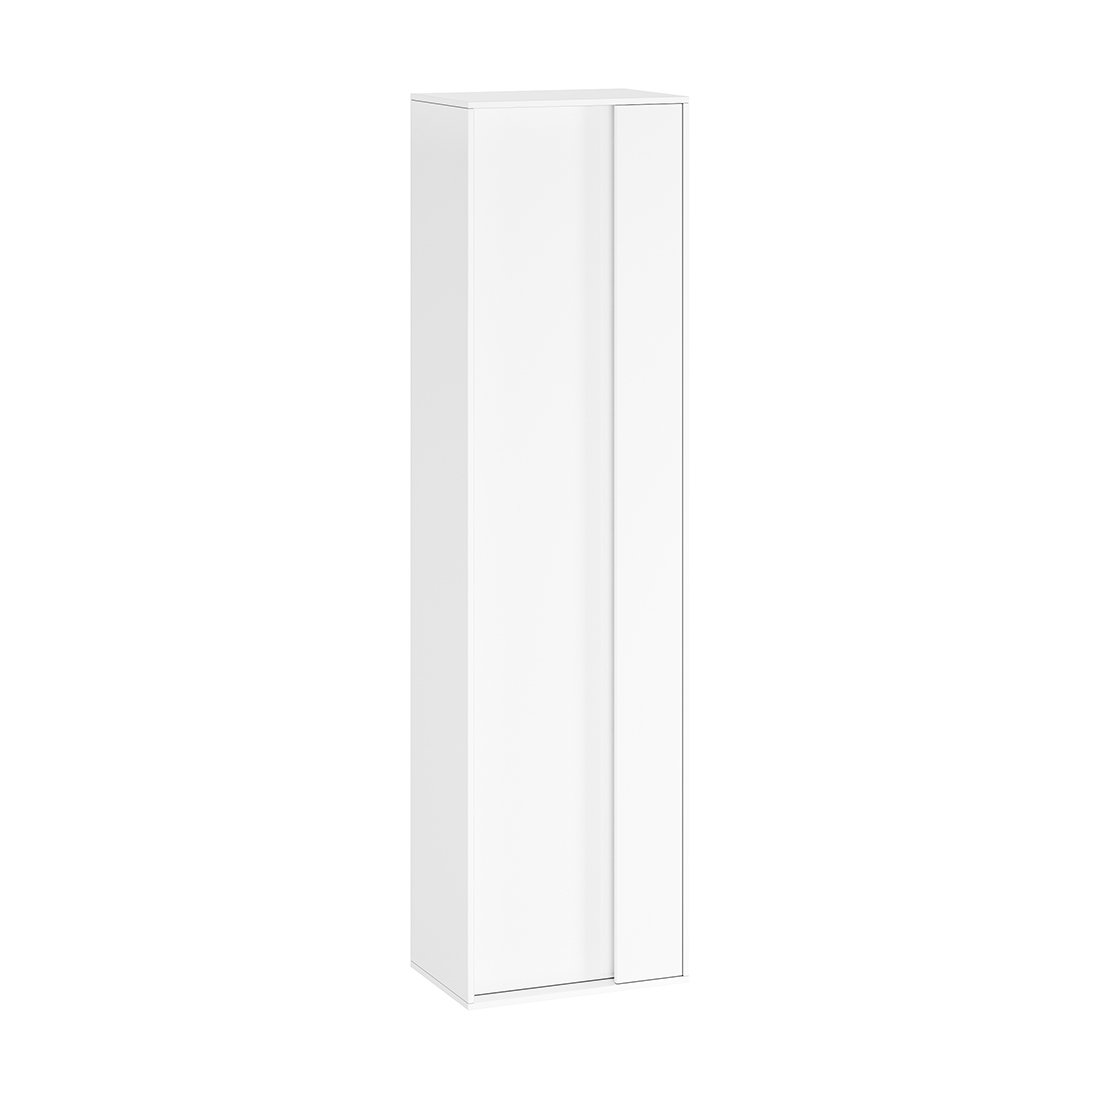 Aukšta spintelė Ravak SB 430 Step, balta/balta